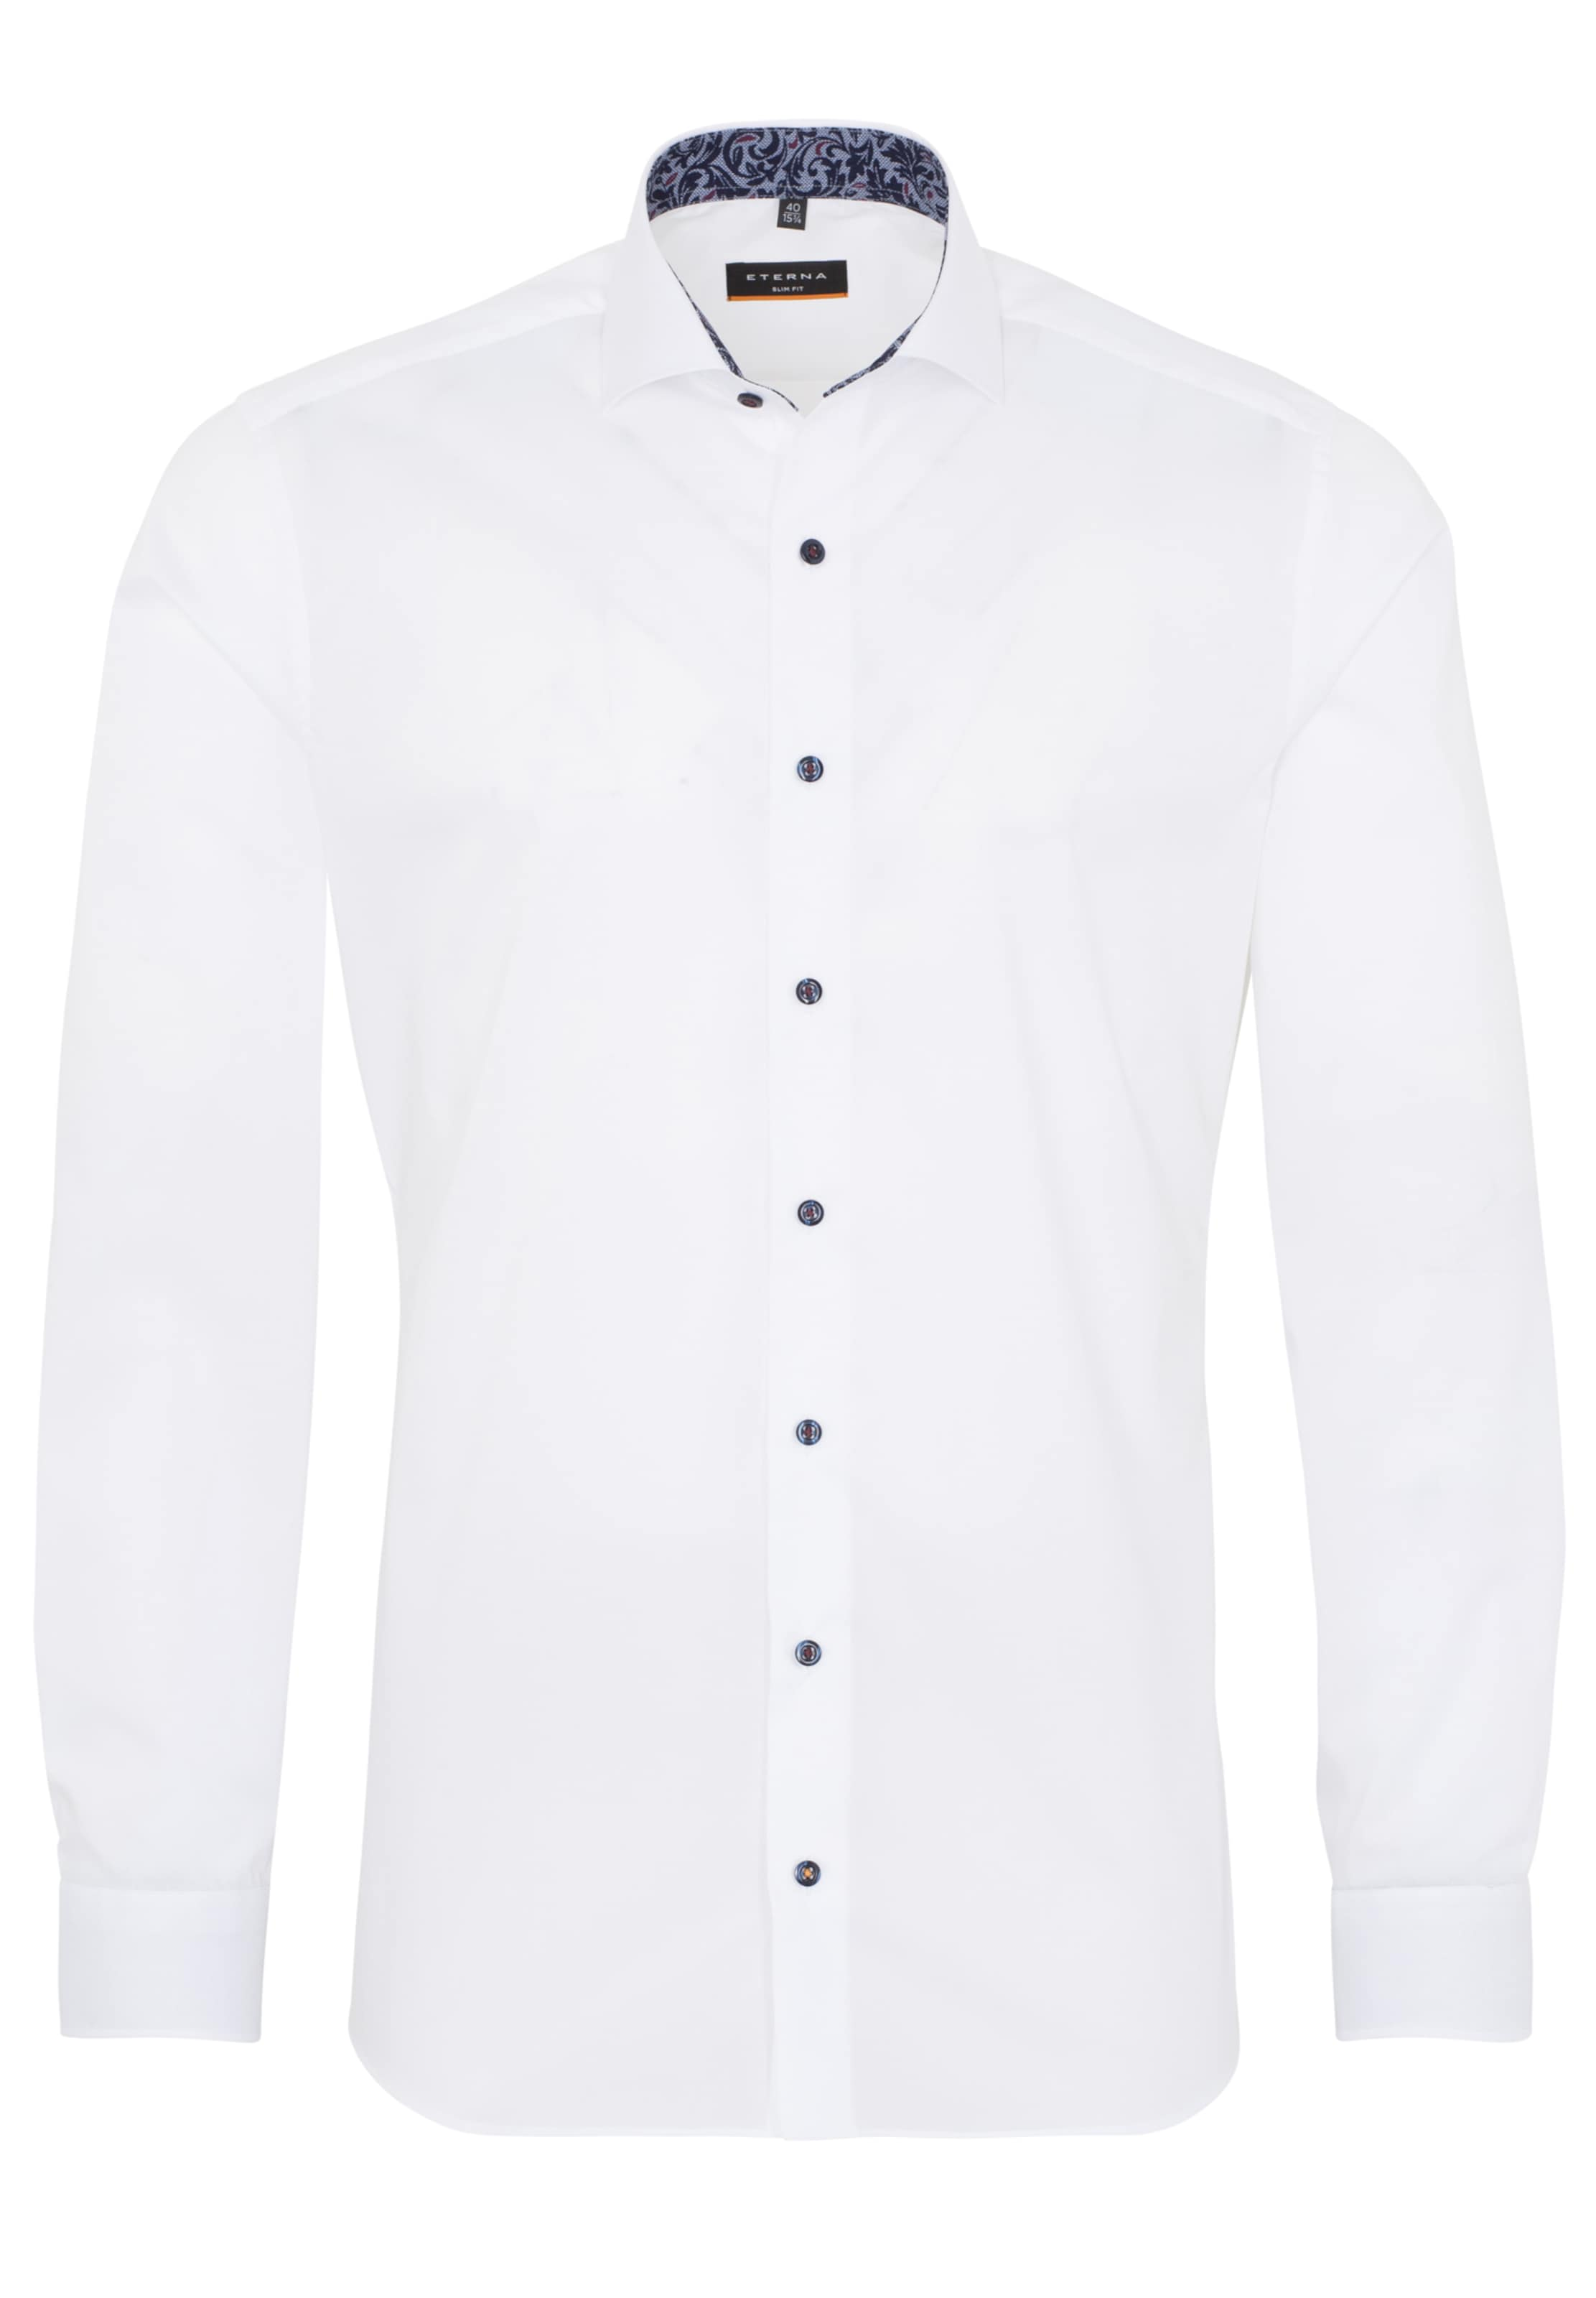 Hemd Eterna Eterna Weiß In Weiß Hemd In wmvN8n0